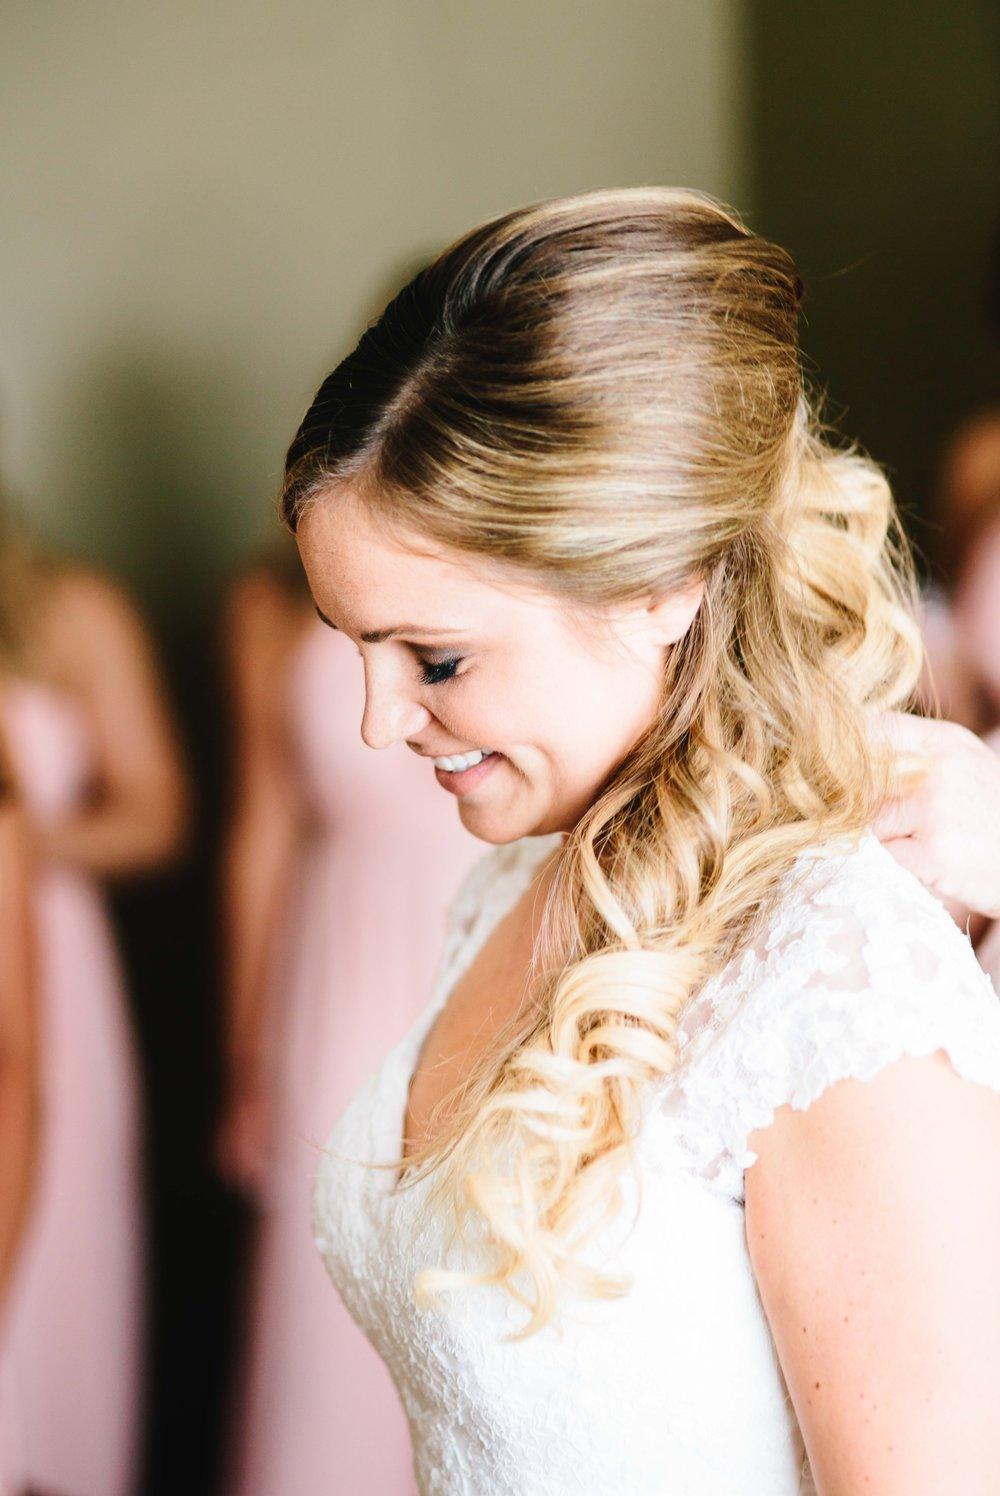 chicago-fine-art-wedding-photography-chiapetta4